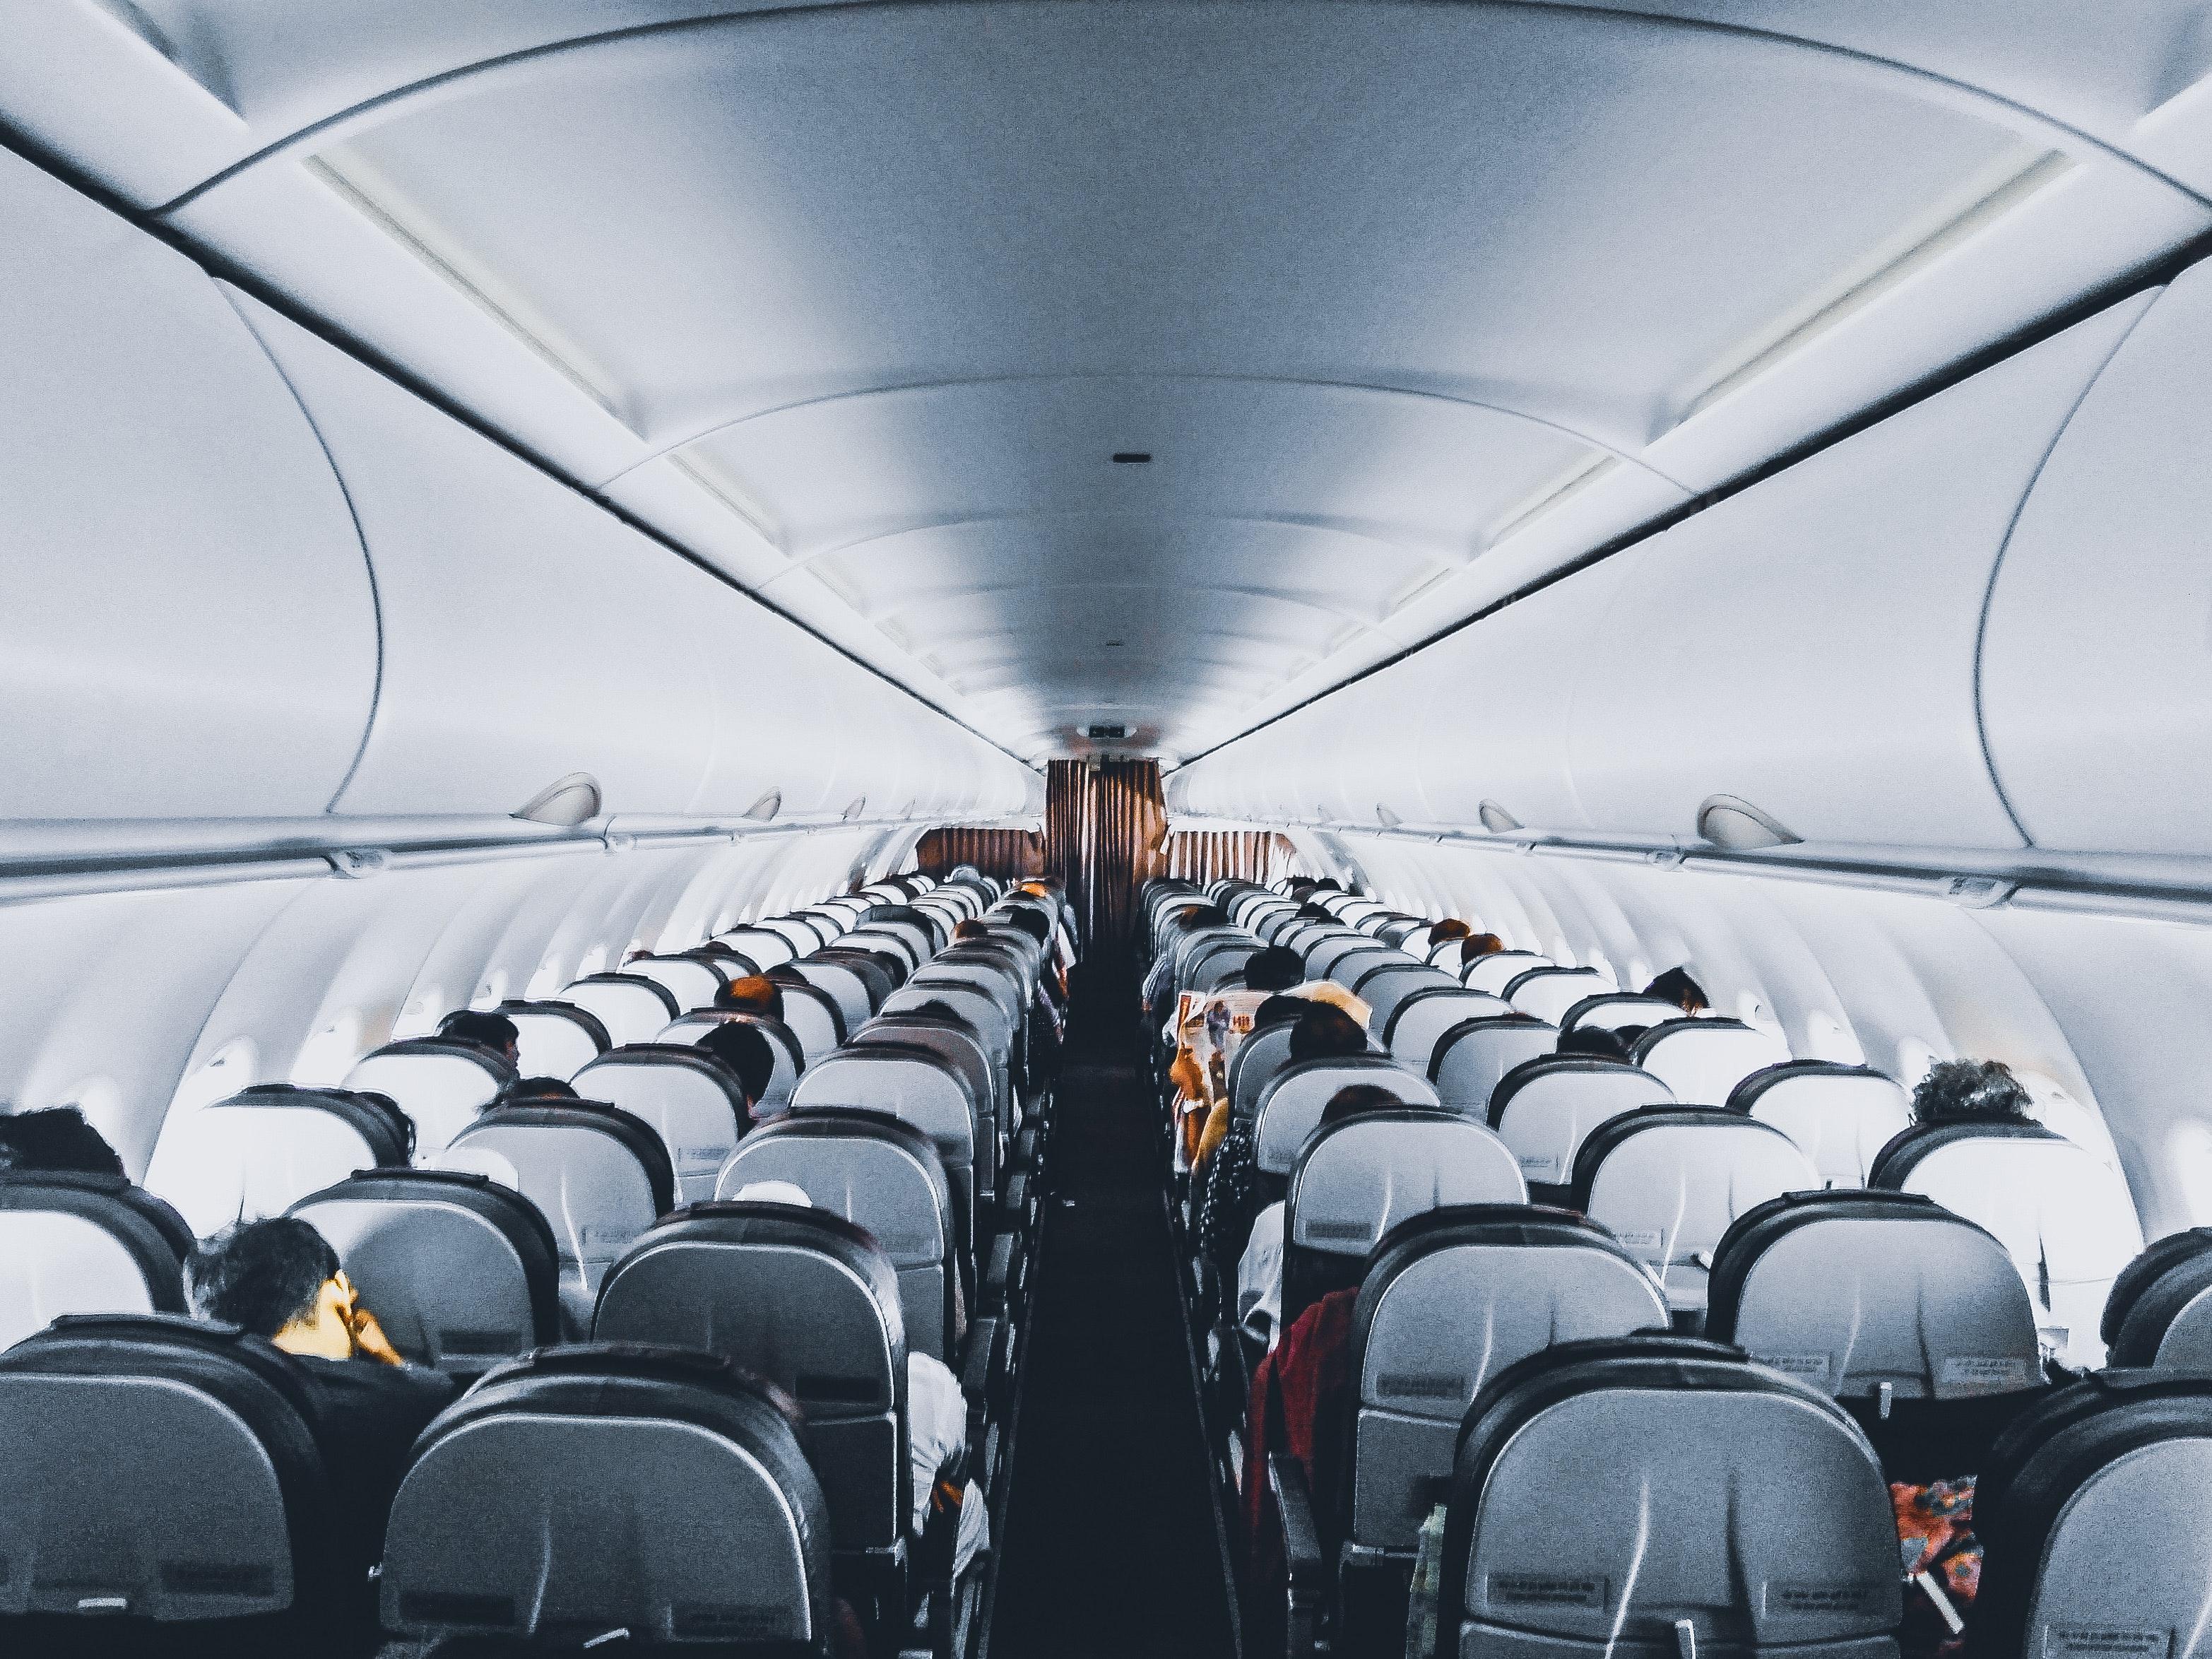 Travel Tech's Response to the Coronavirus Crisis